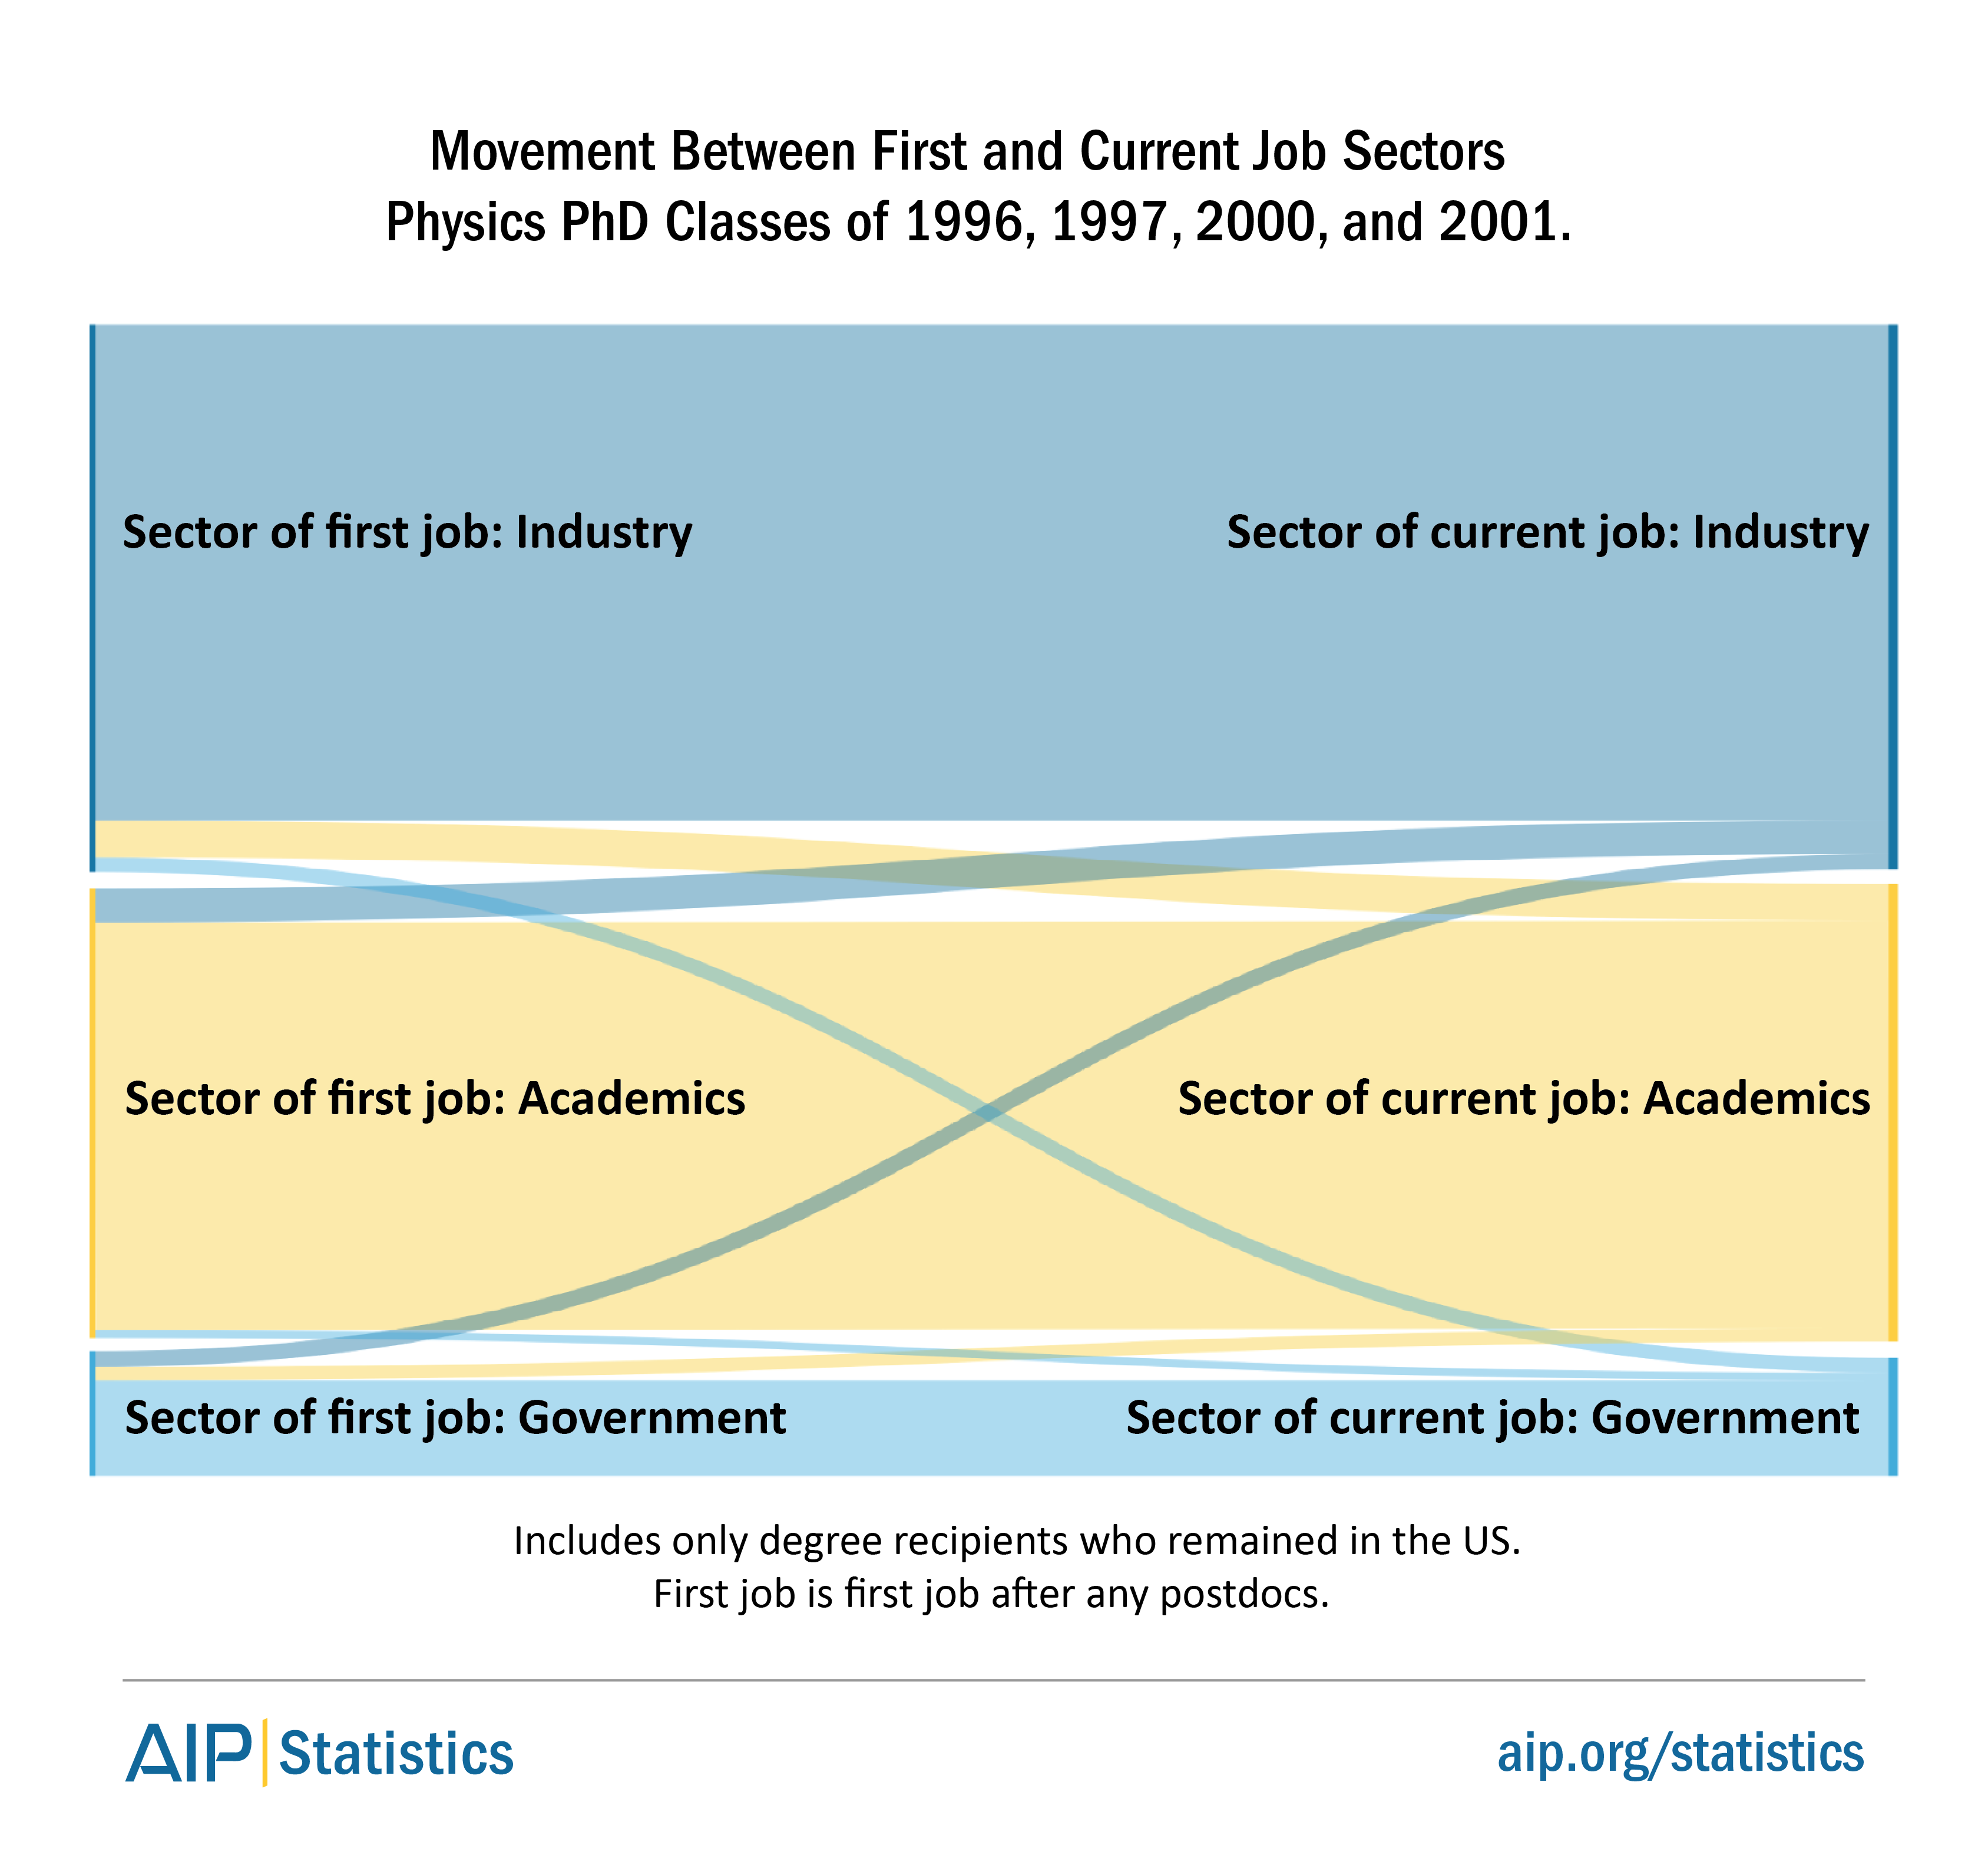 Movement between first and current job sectors